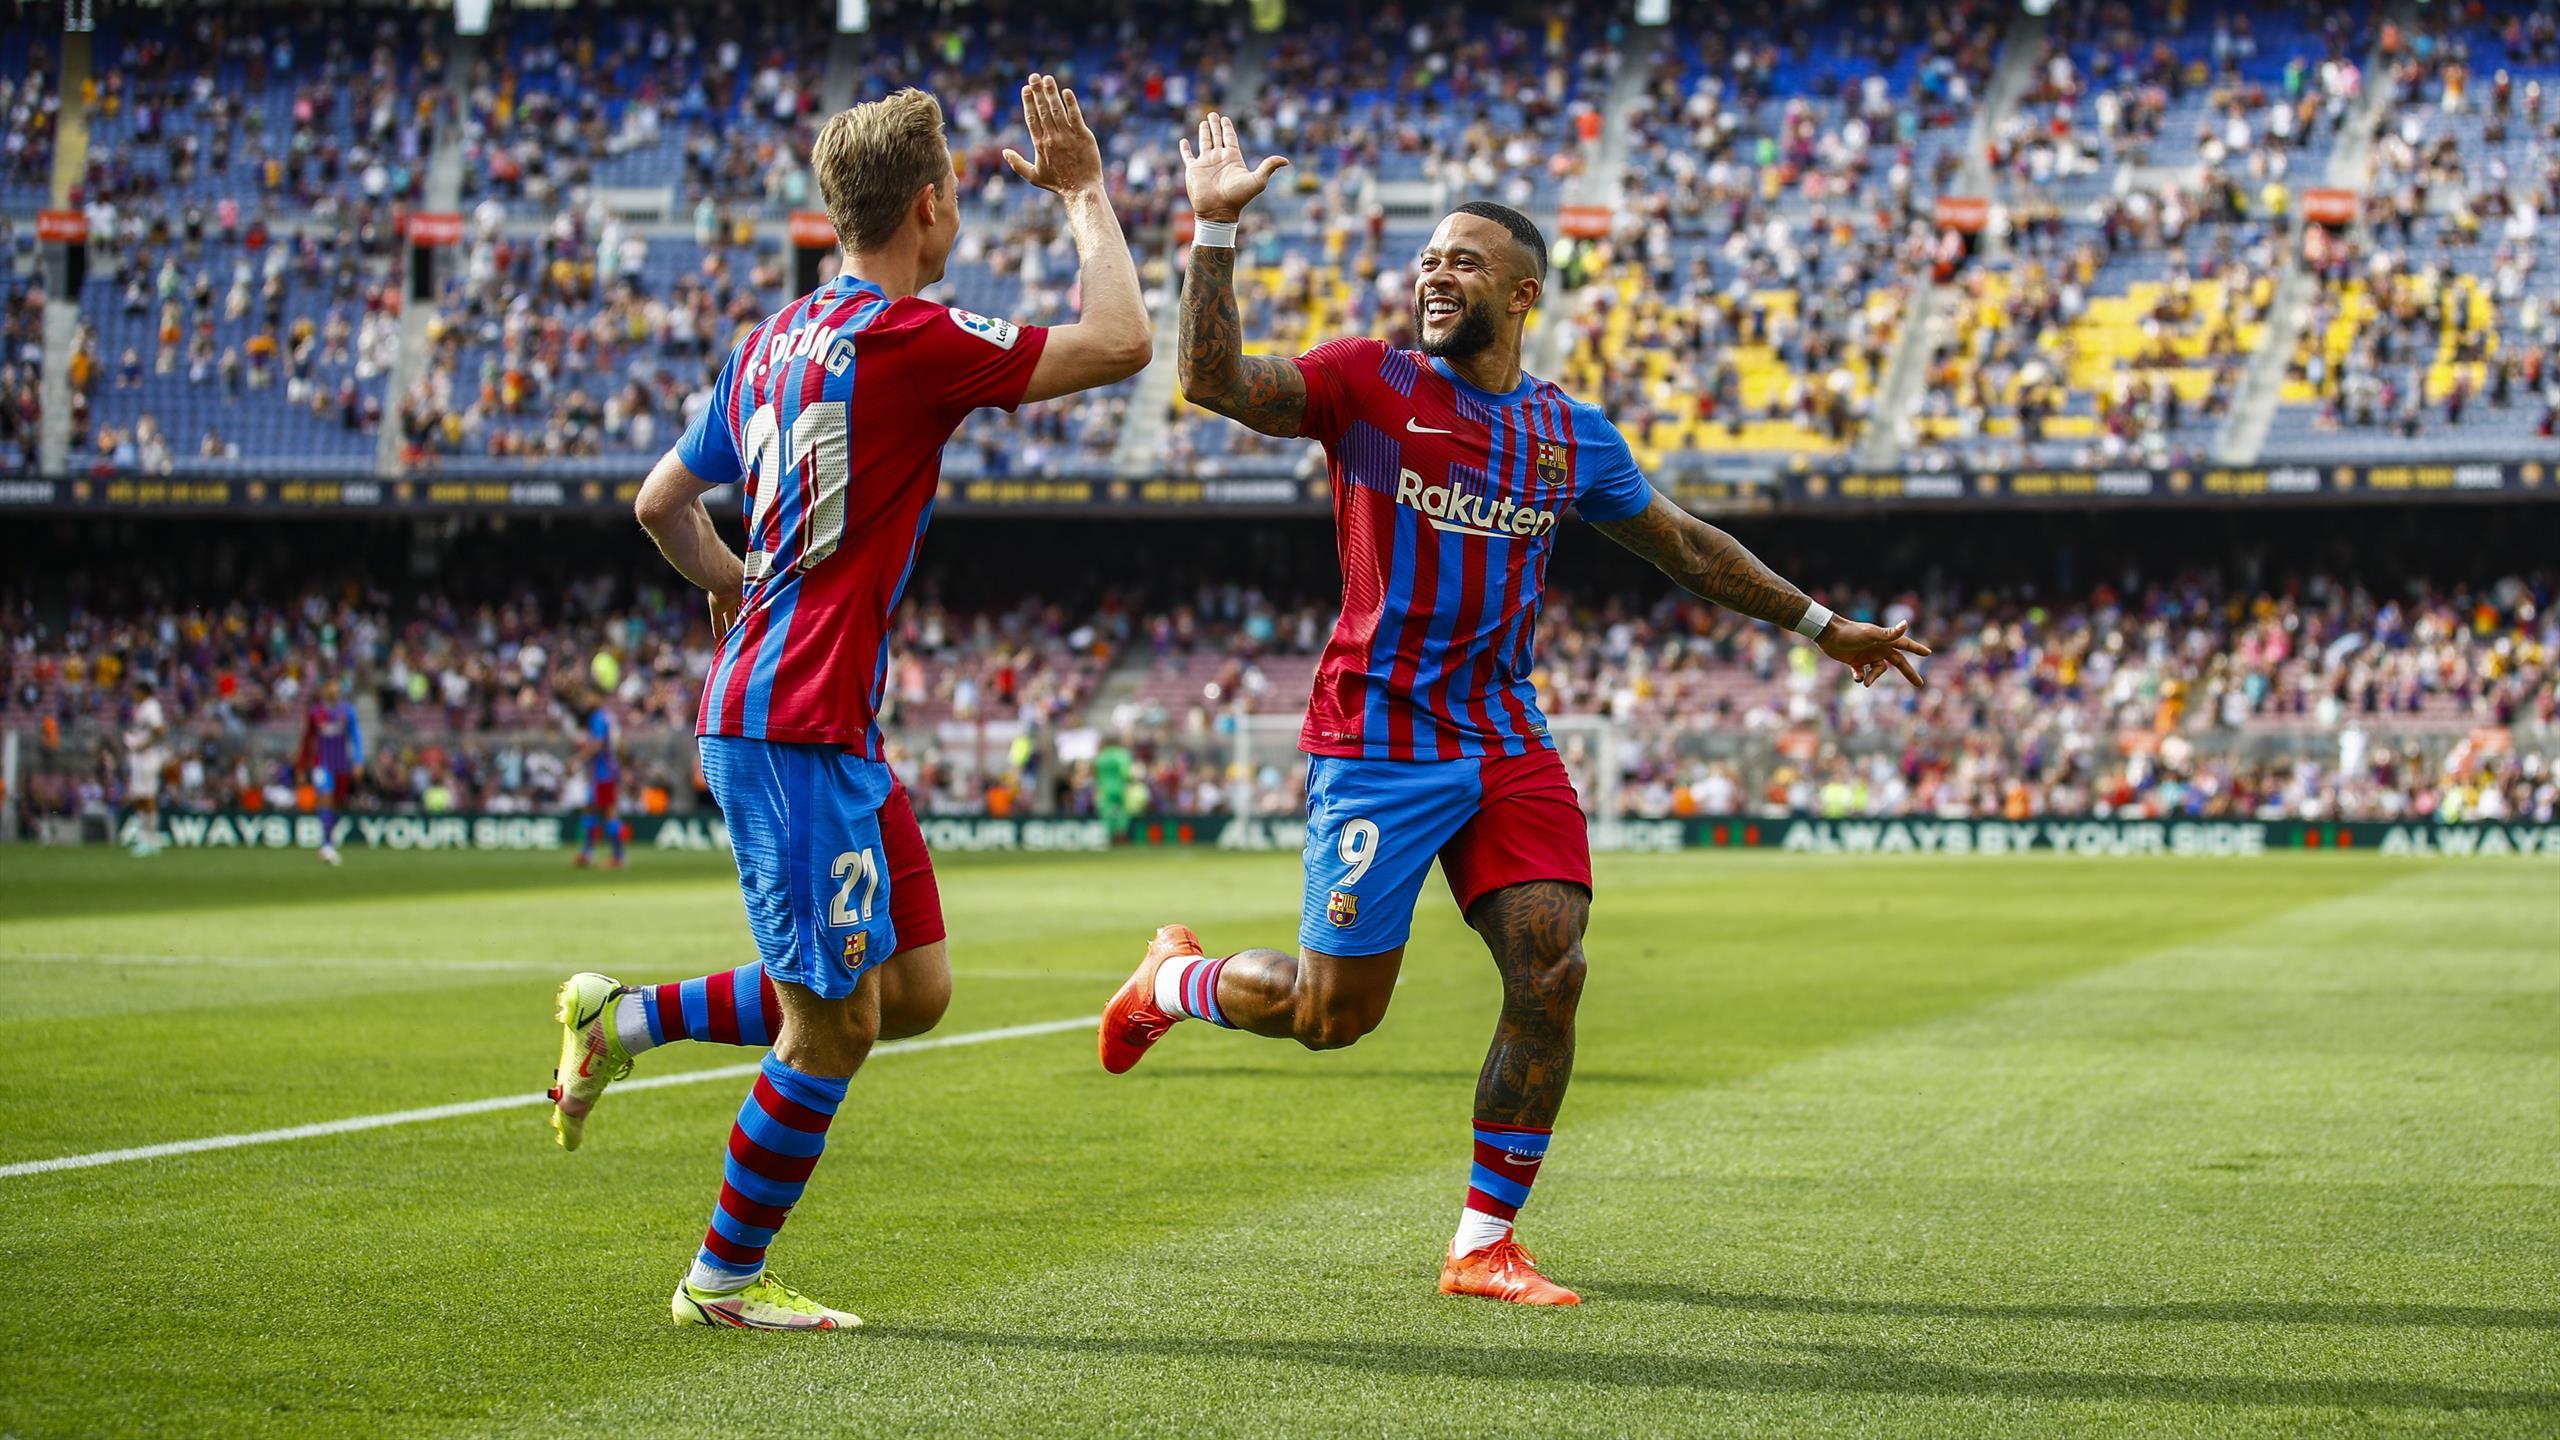 Depay on target in narrow Barca win over Getafe